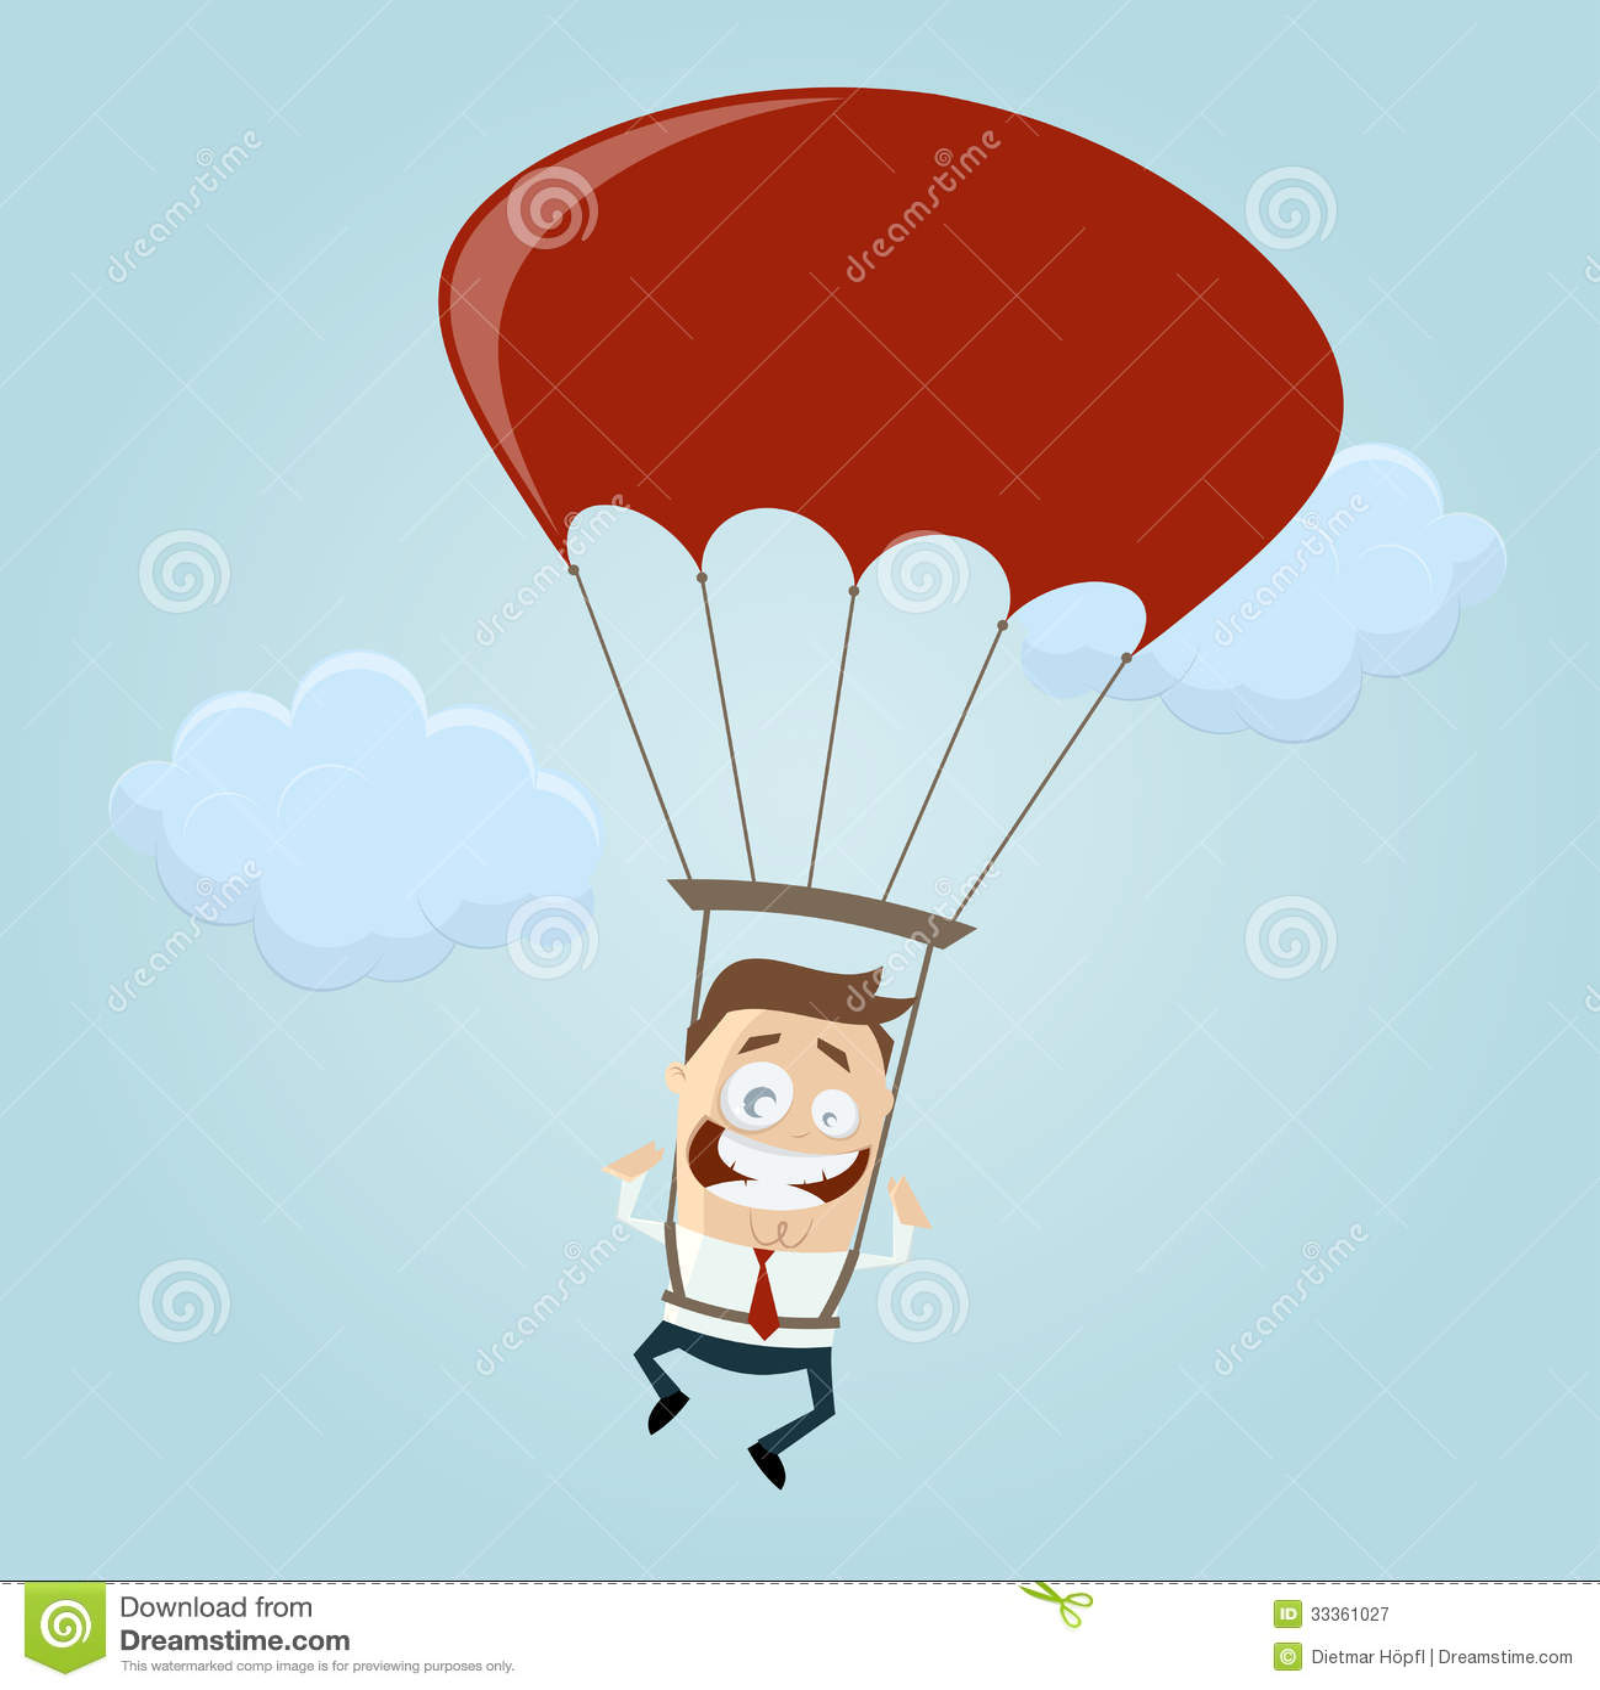 business-man-parachute-funny-illustratio